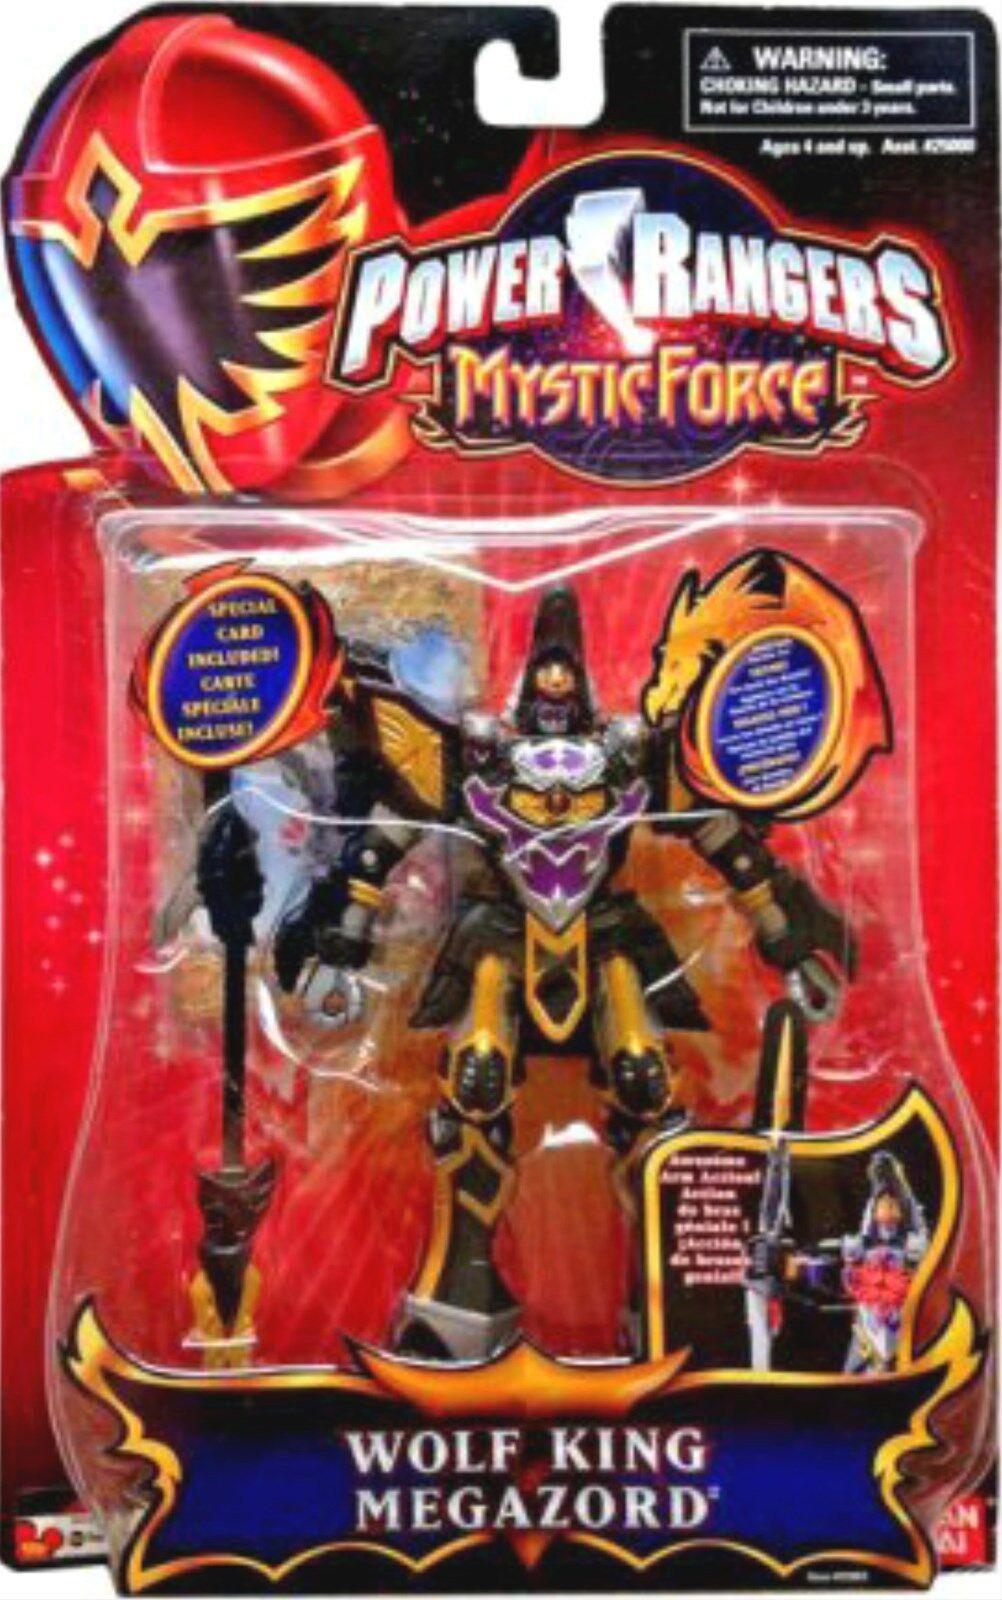 mejor calidad Power Rangers Mystic Force 6  Caballero Rey Lobo Lobo Lobo Megazord Lightup Ranger 2006 Nuevo  muchas sorpresas